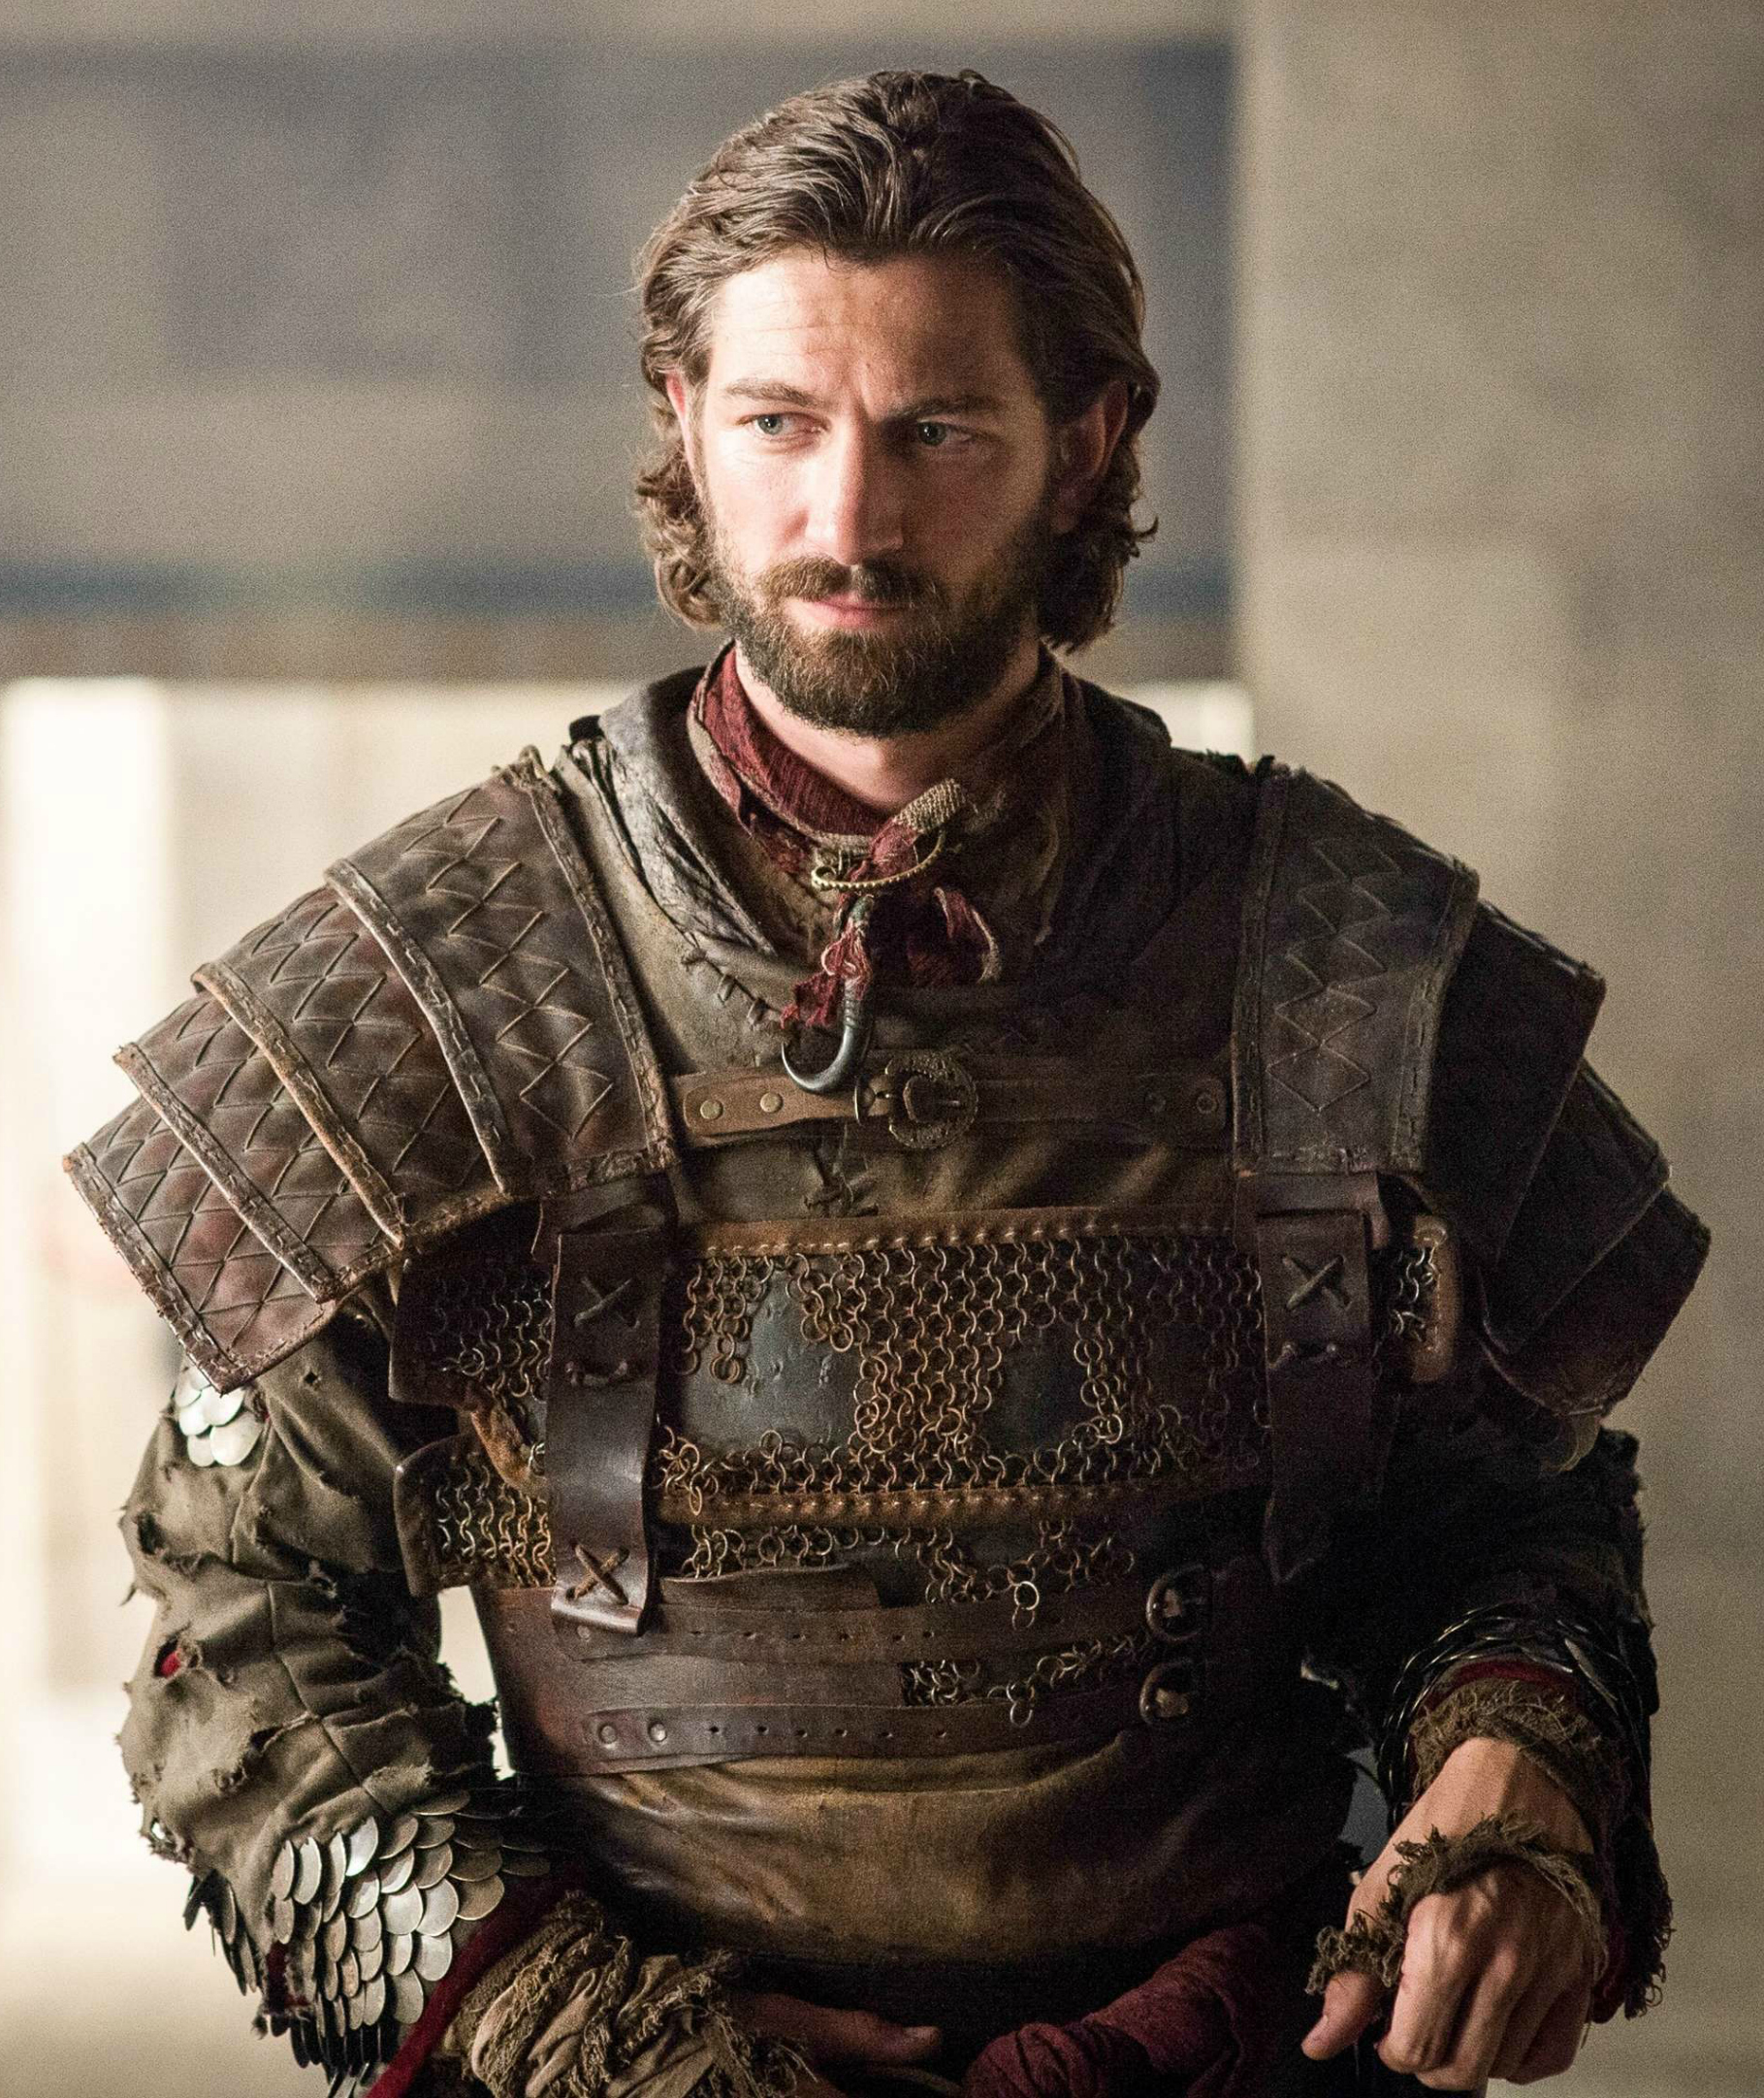 6 guerrieri di Game of Thrones che potrebbero pestare La ... Daario Naharis Arakh